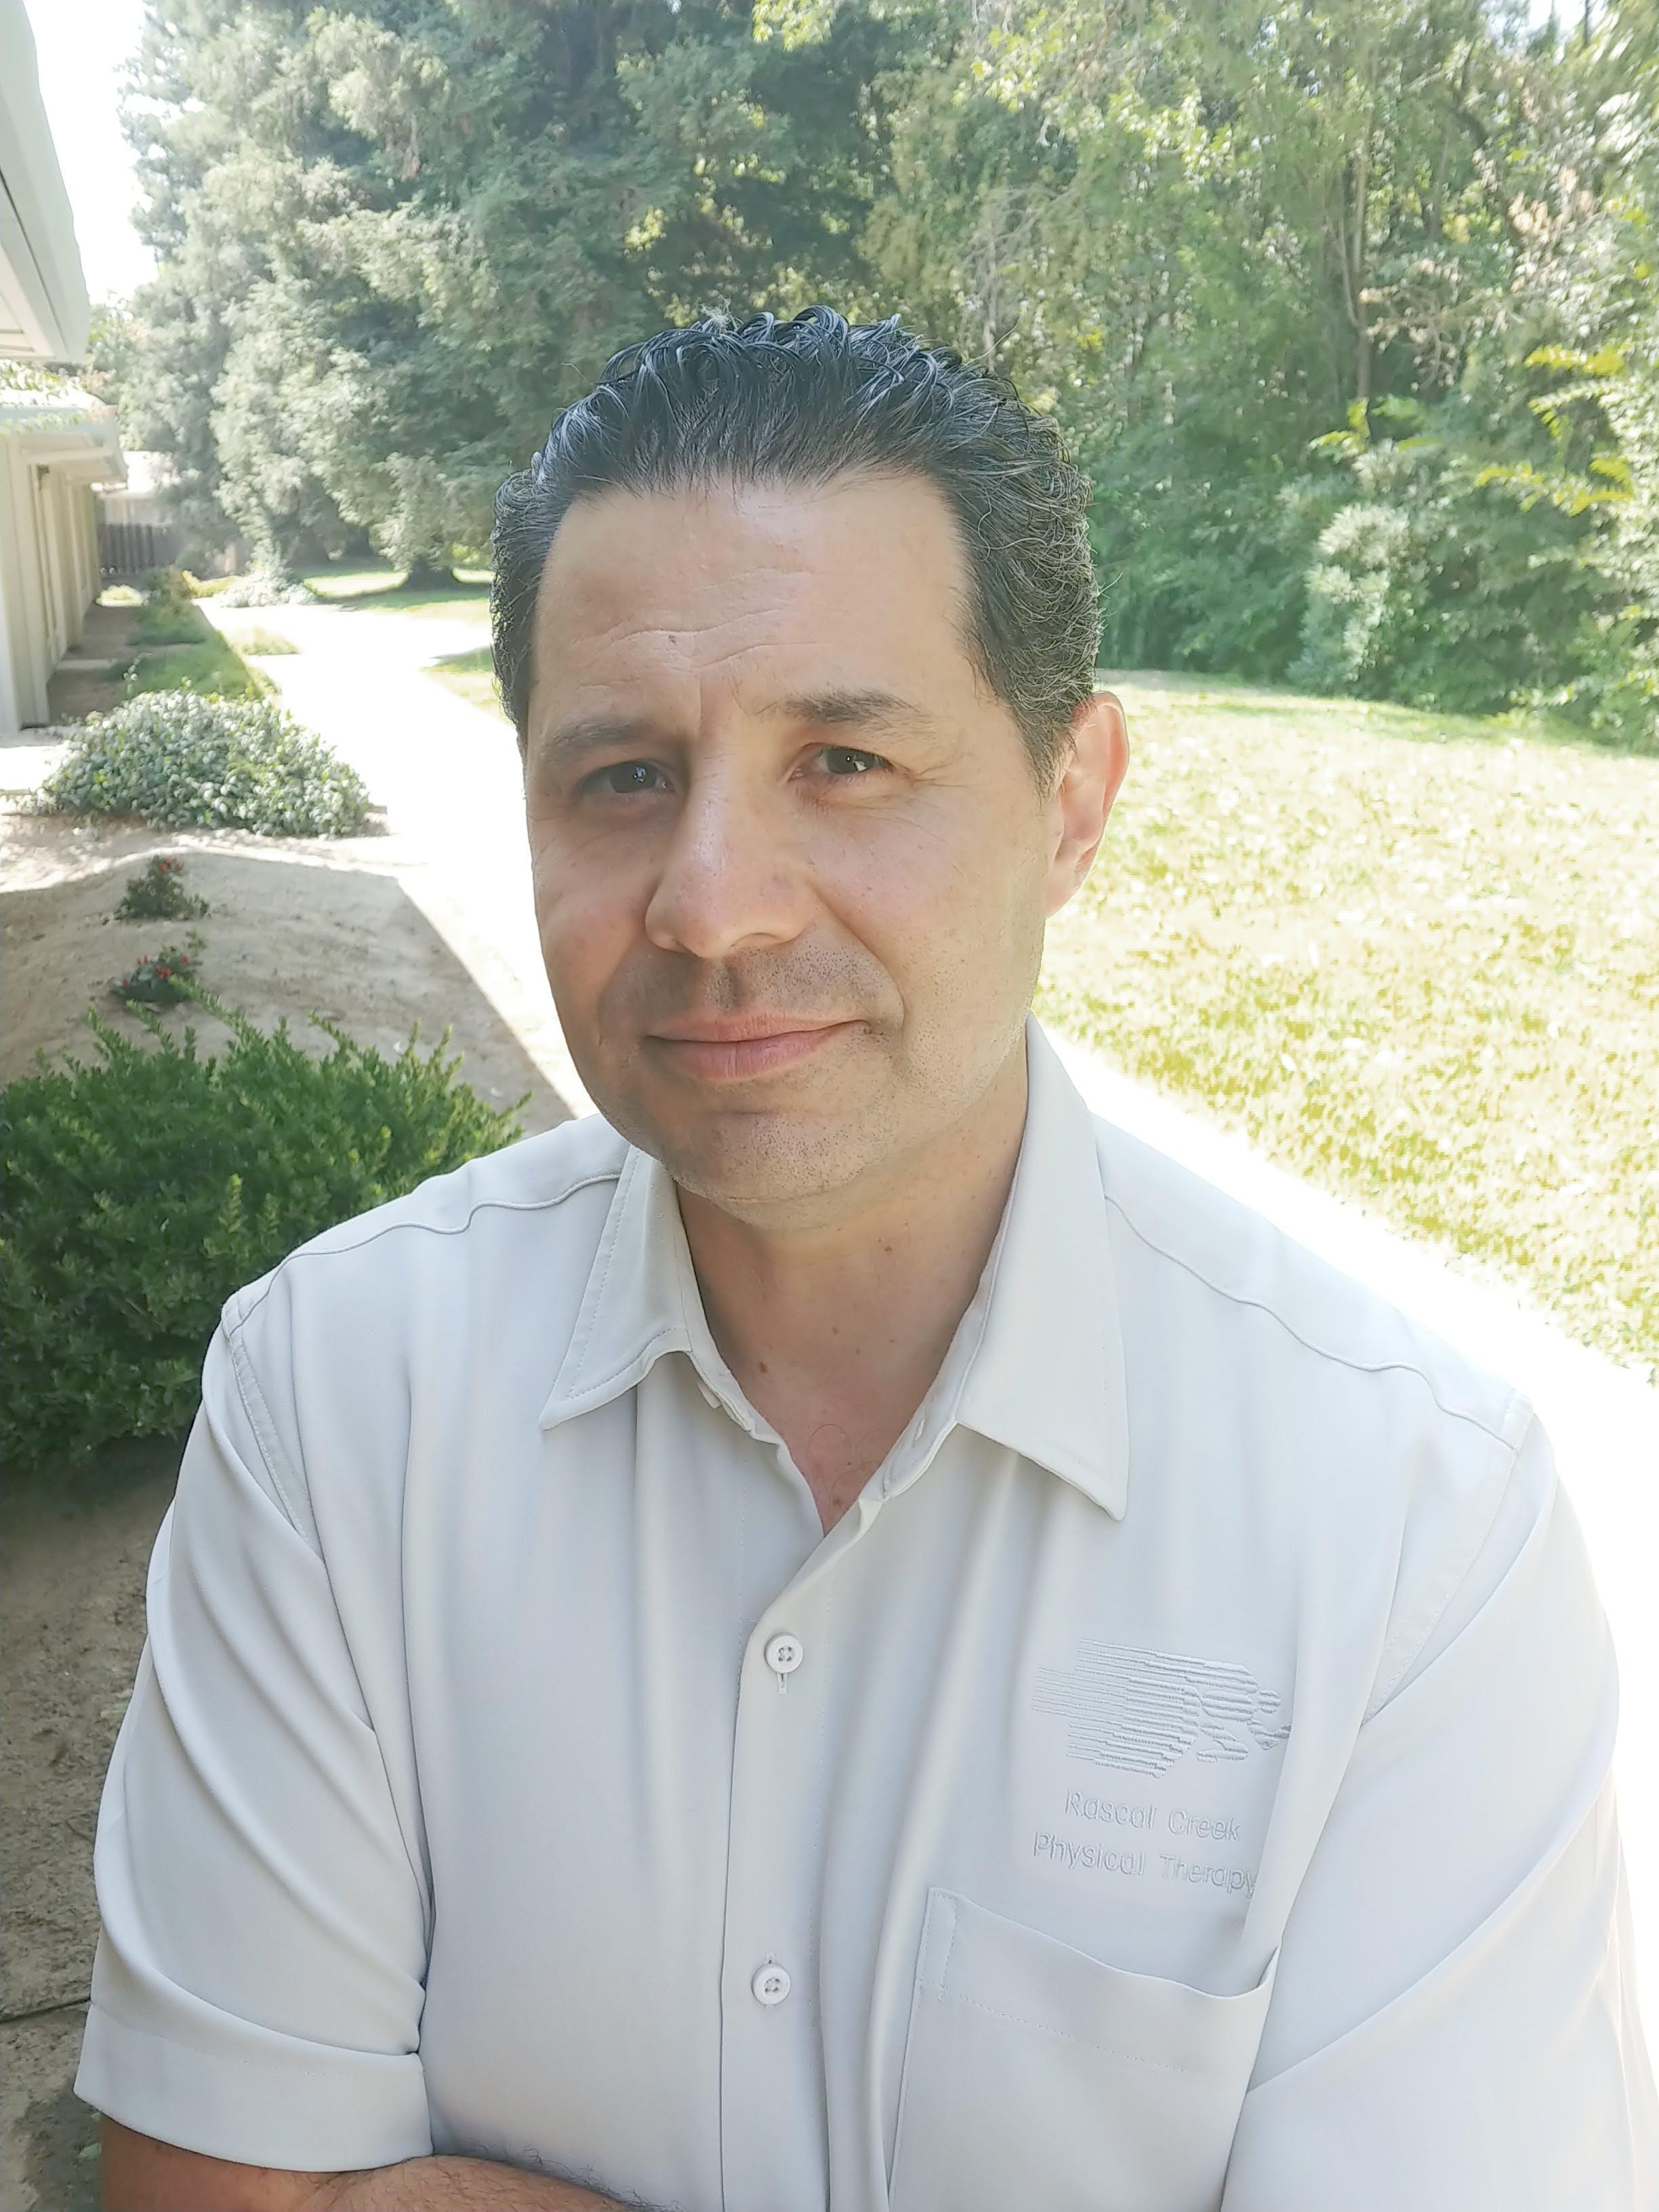 Tony Hernandez, PT, DPT